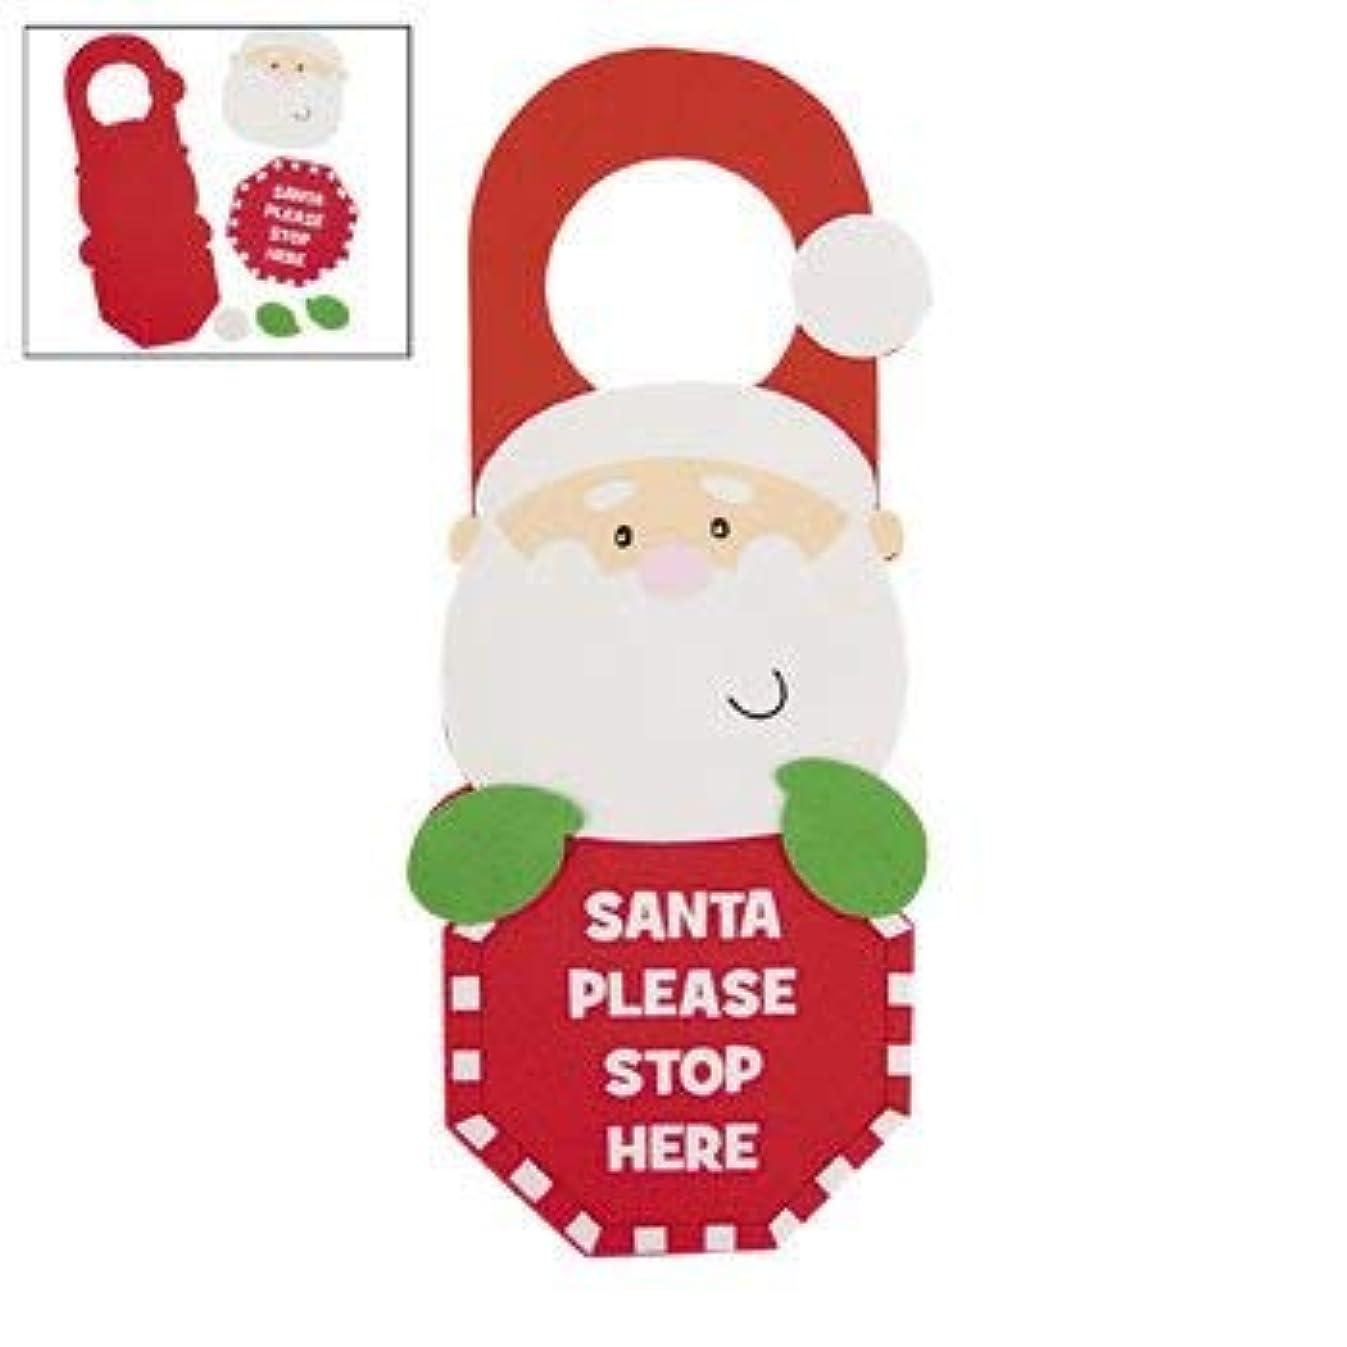 Santa Stop Here Door Hanger Craft Kit - Crafts for Kids and Decoration-makes 12